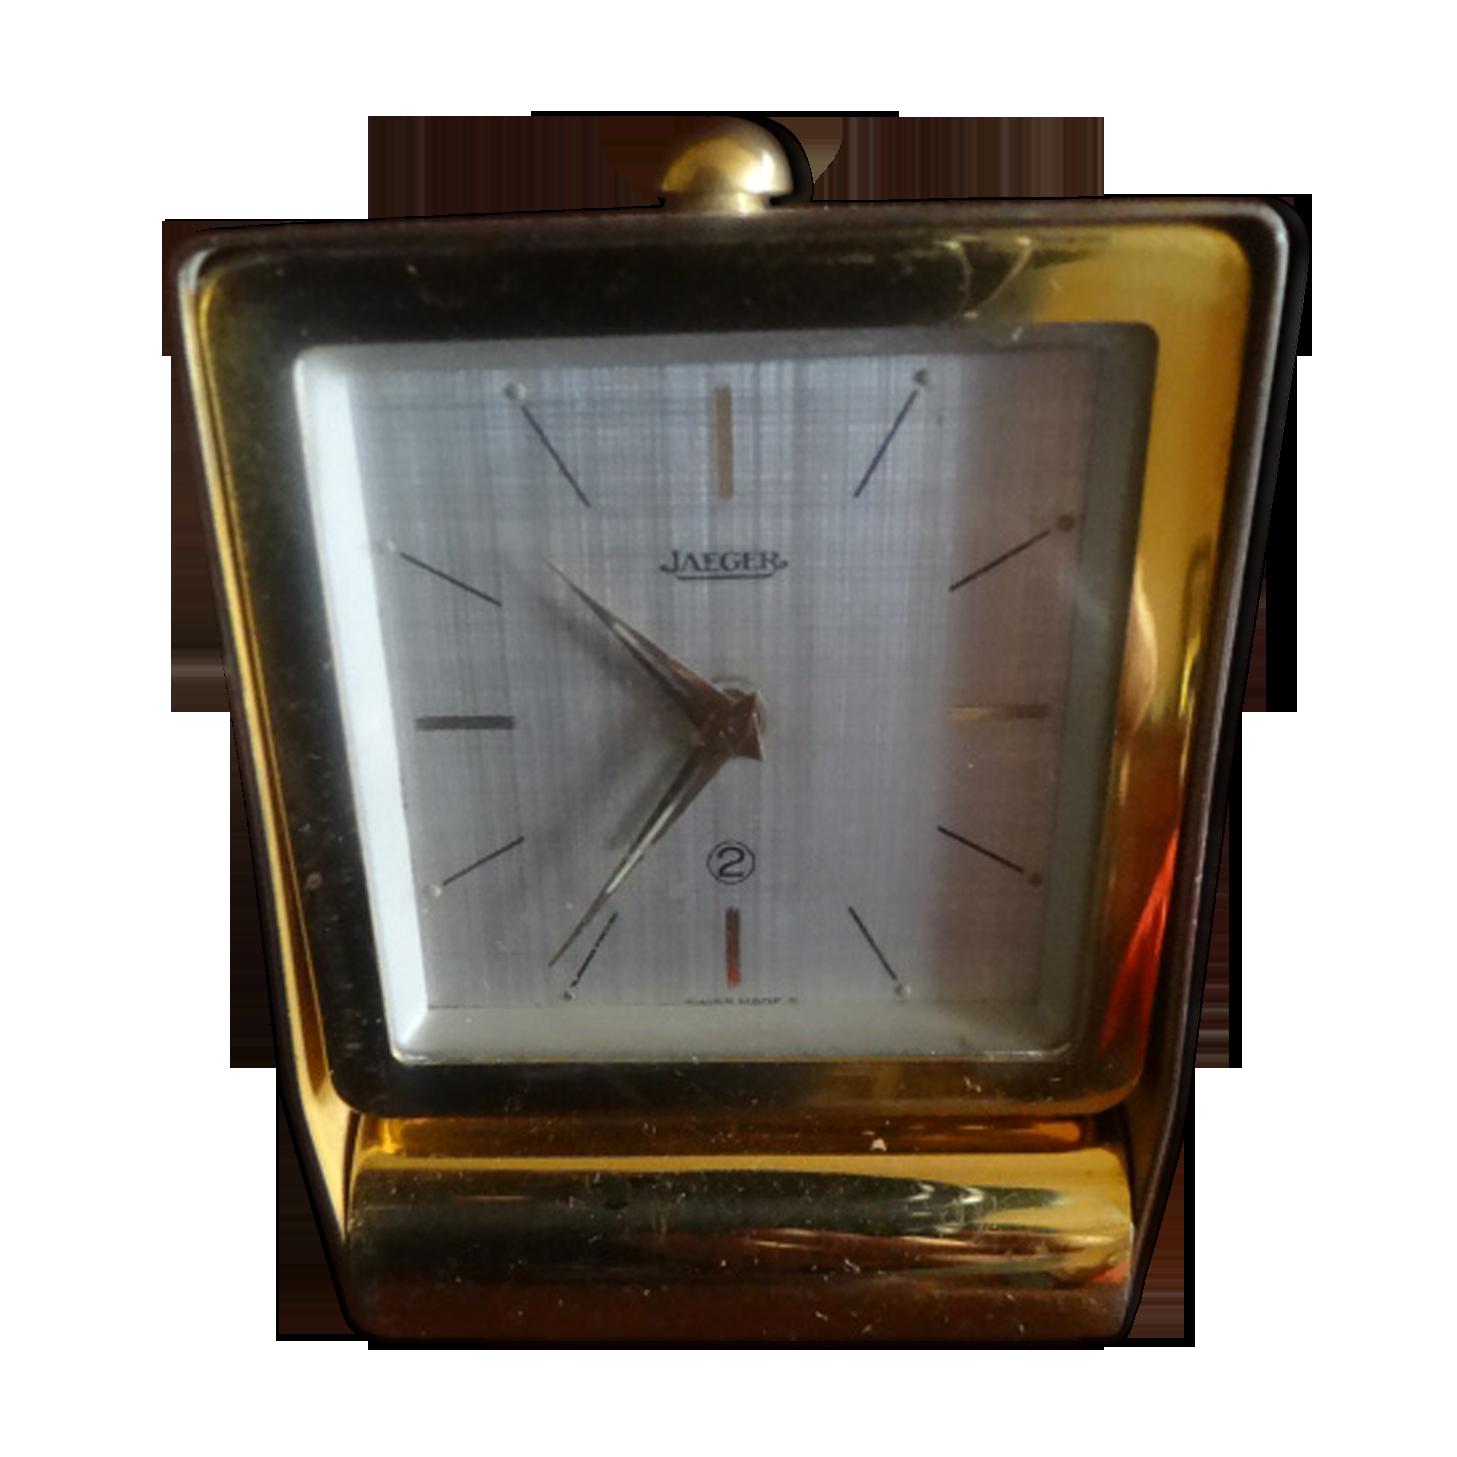 Horloge De Bureau Originale collections ancienne pendule de bureau horloge jaeger